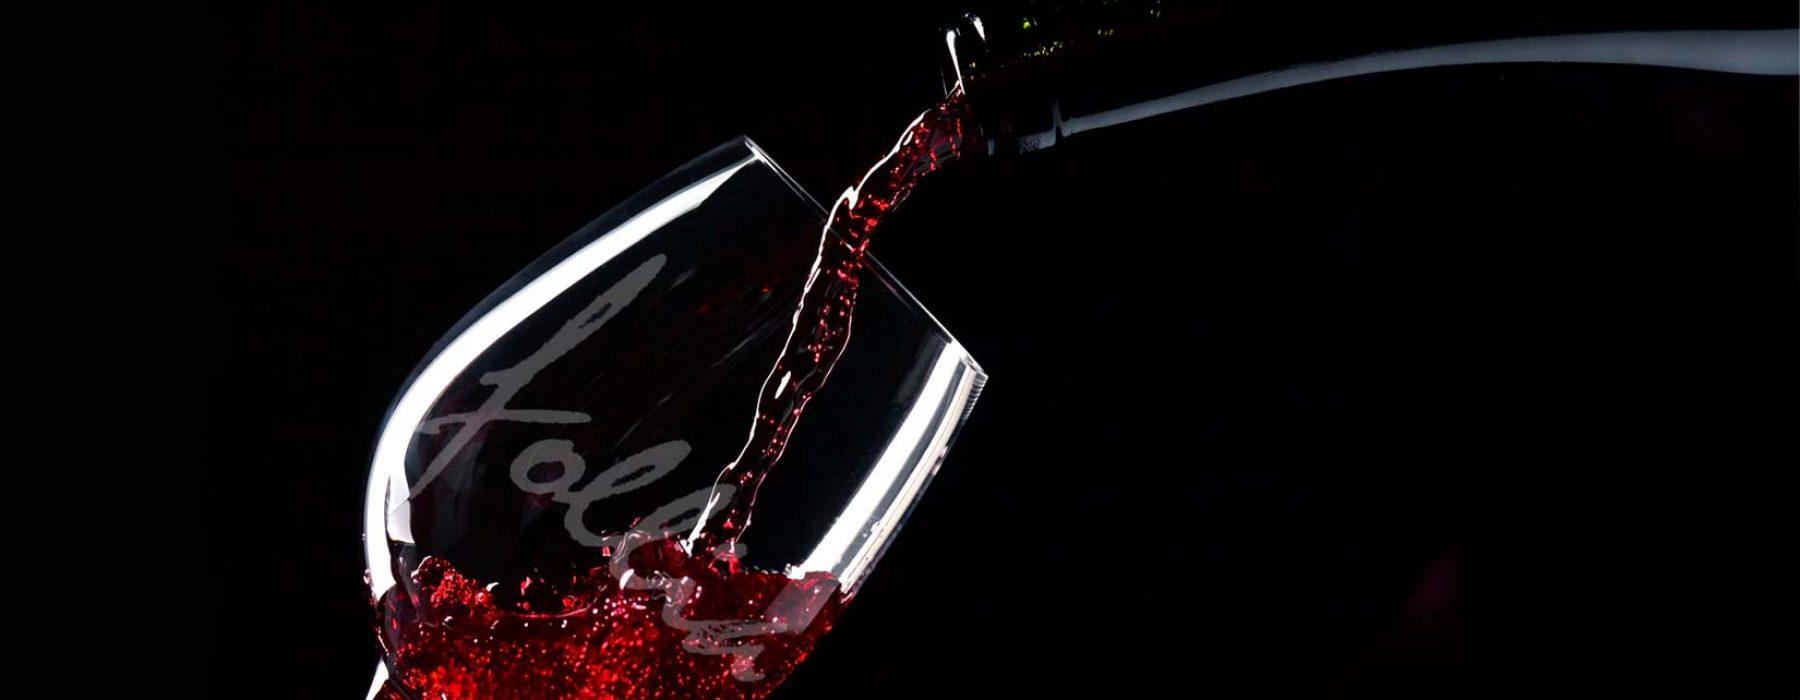 Piana dei Castelli: 愛情をこめたワイン